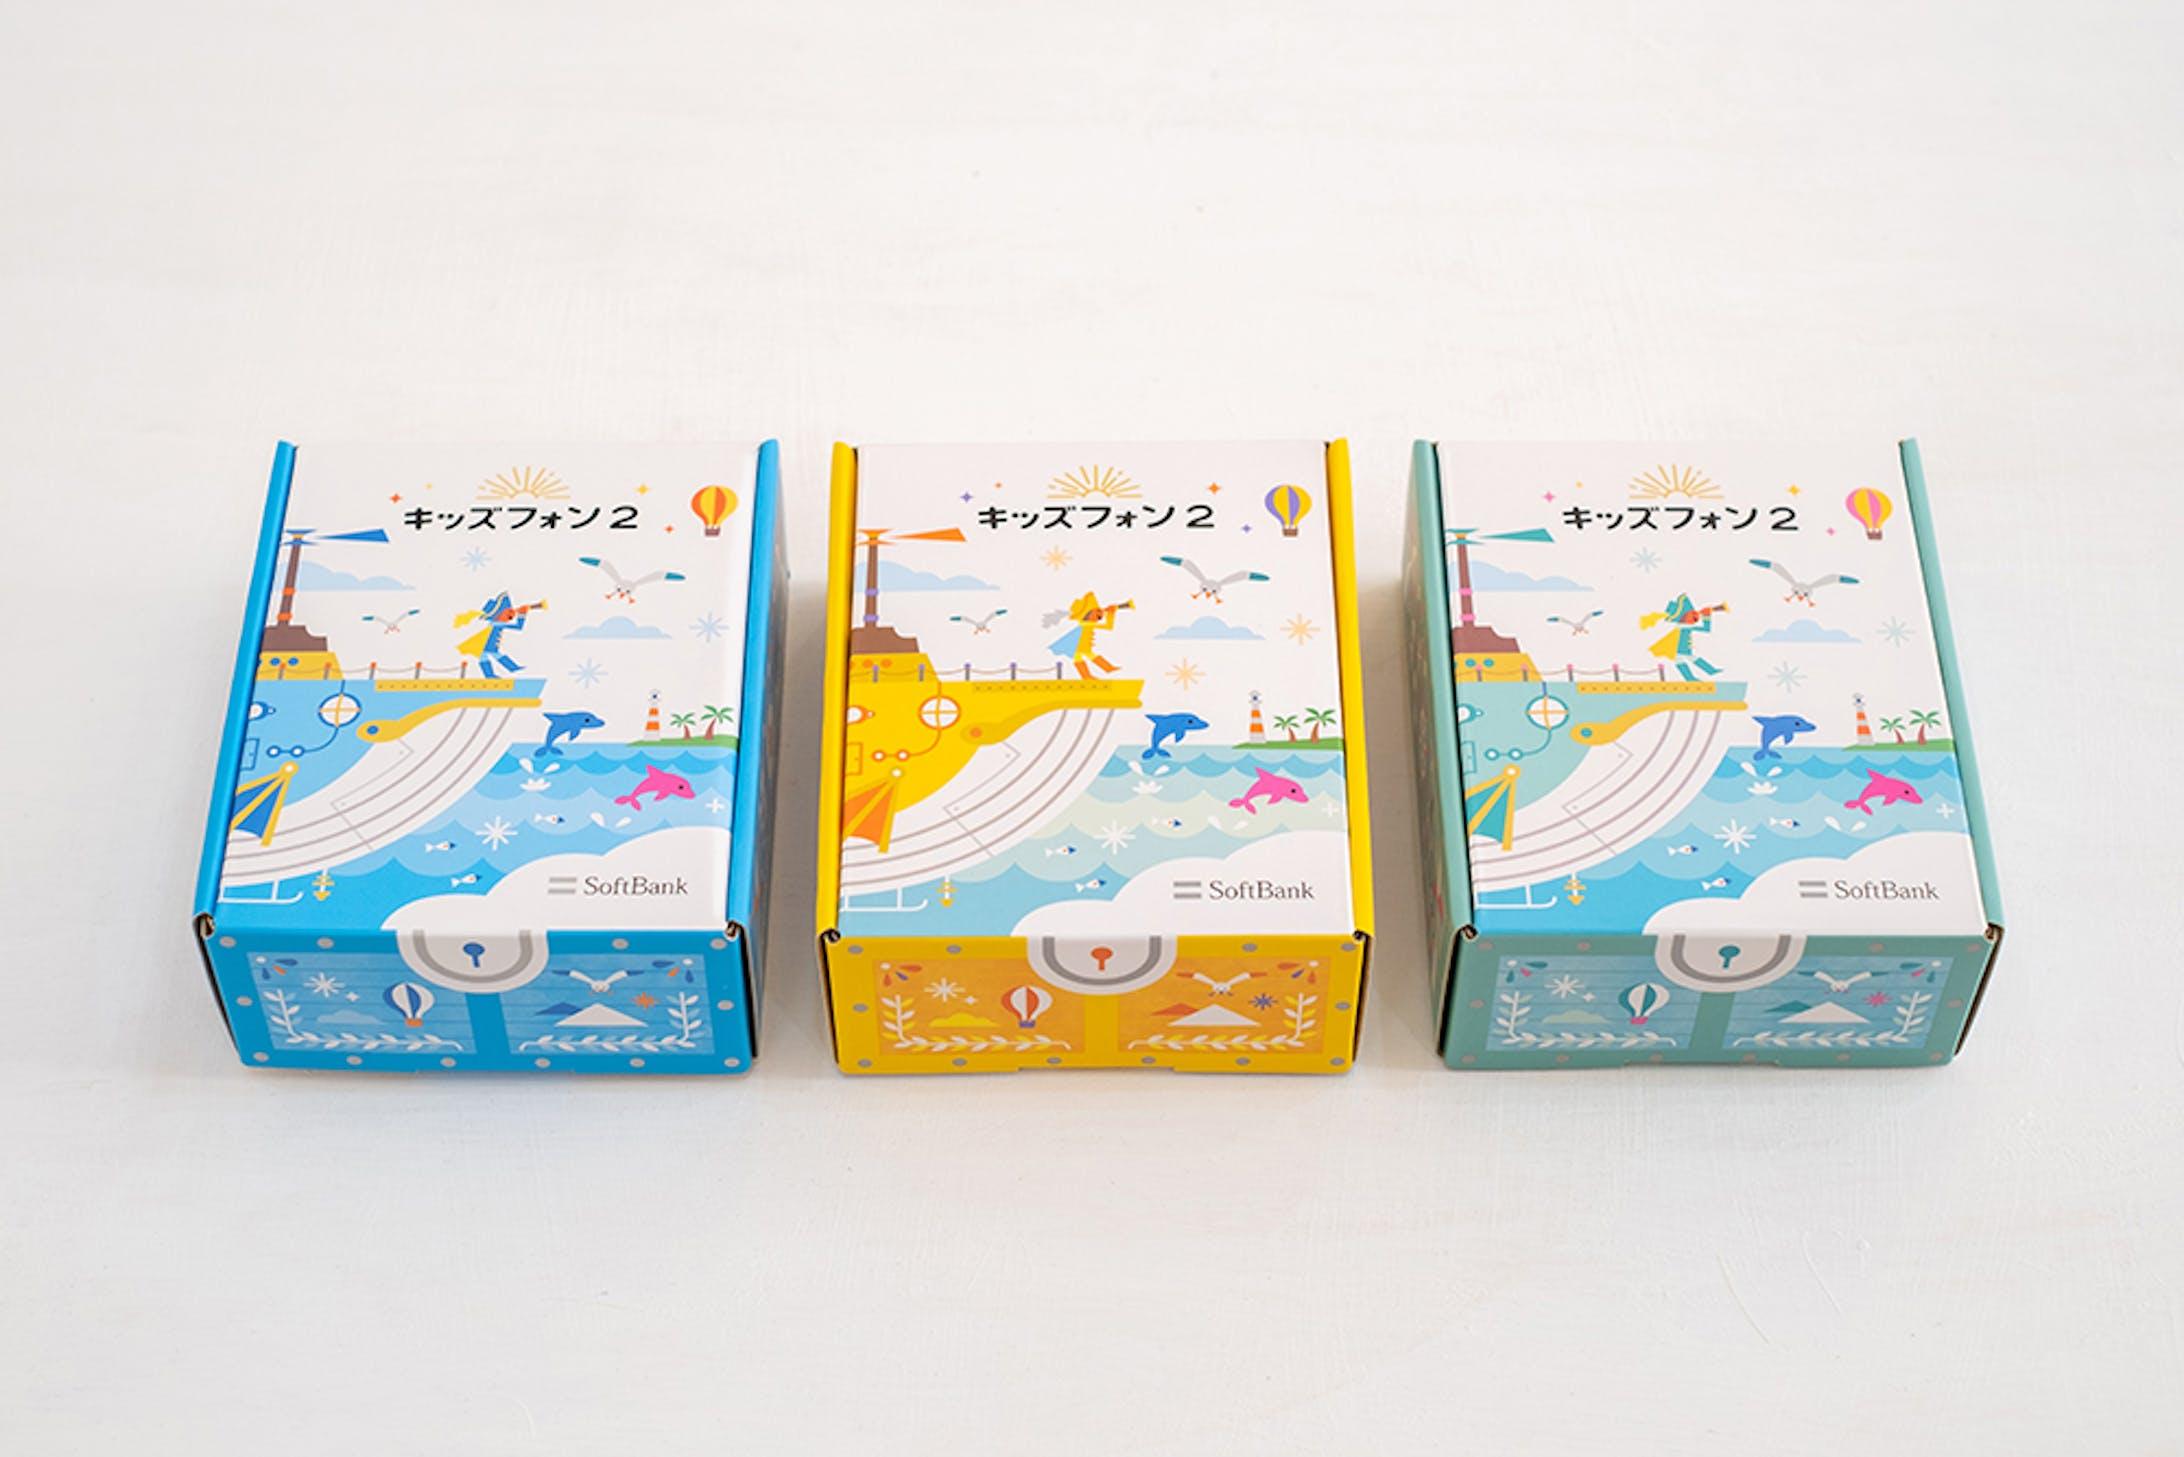 SoftBank キッズフォン2-2